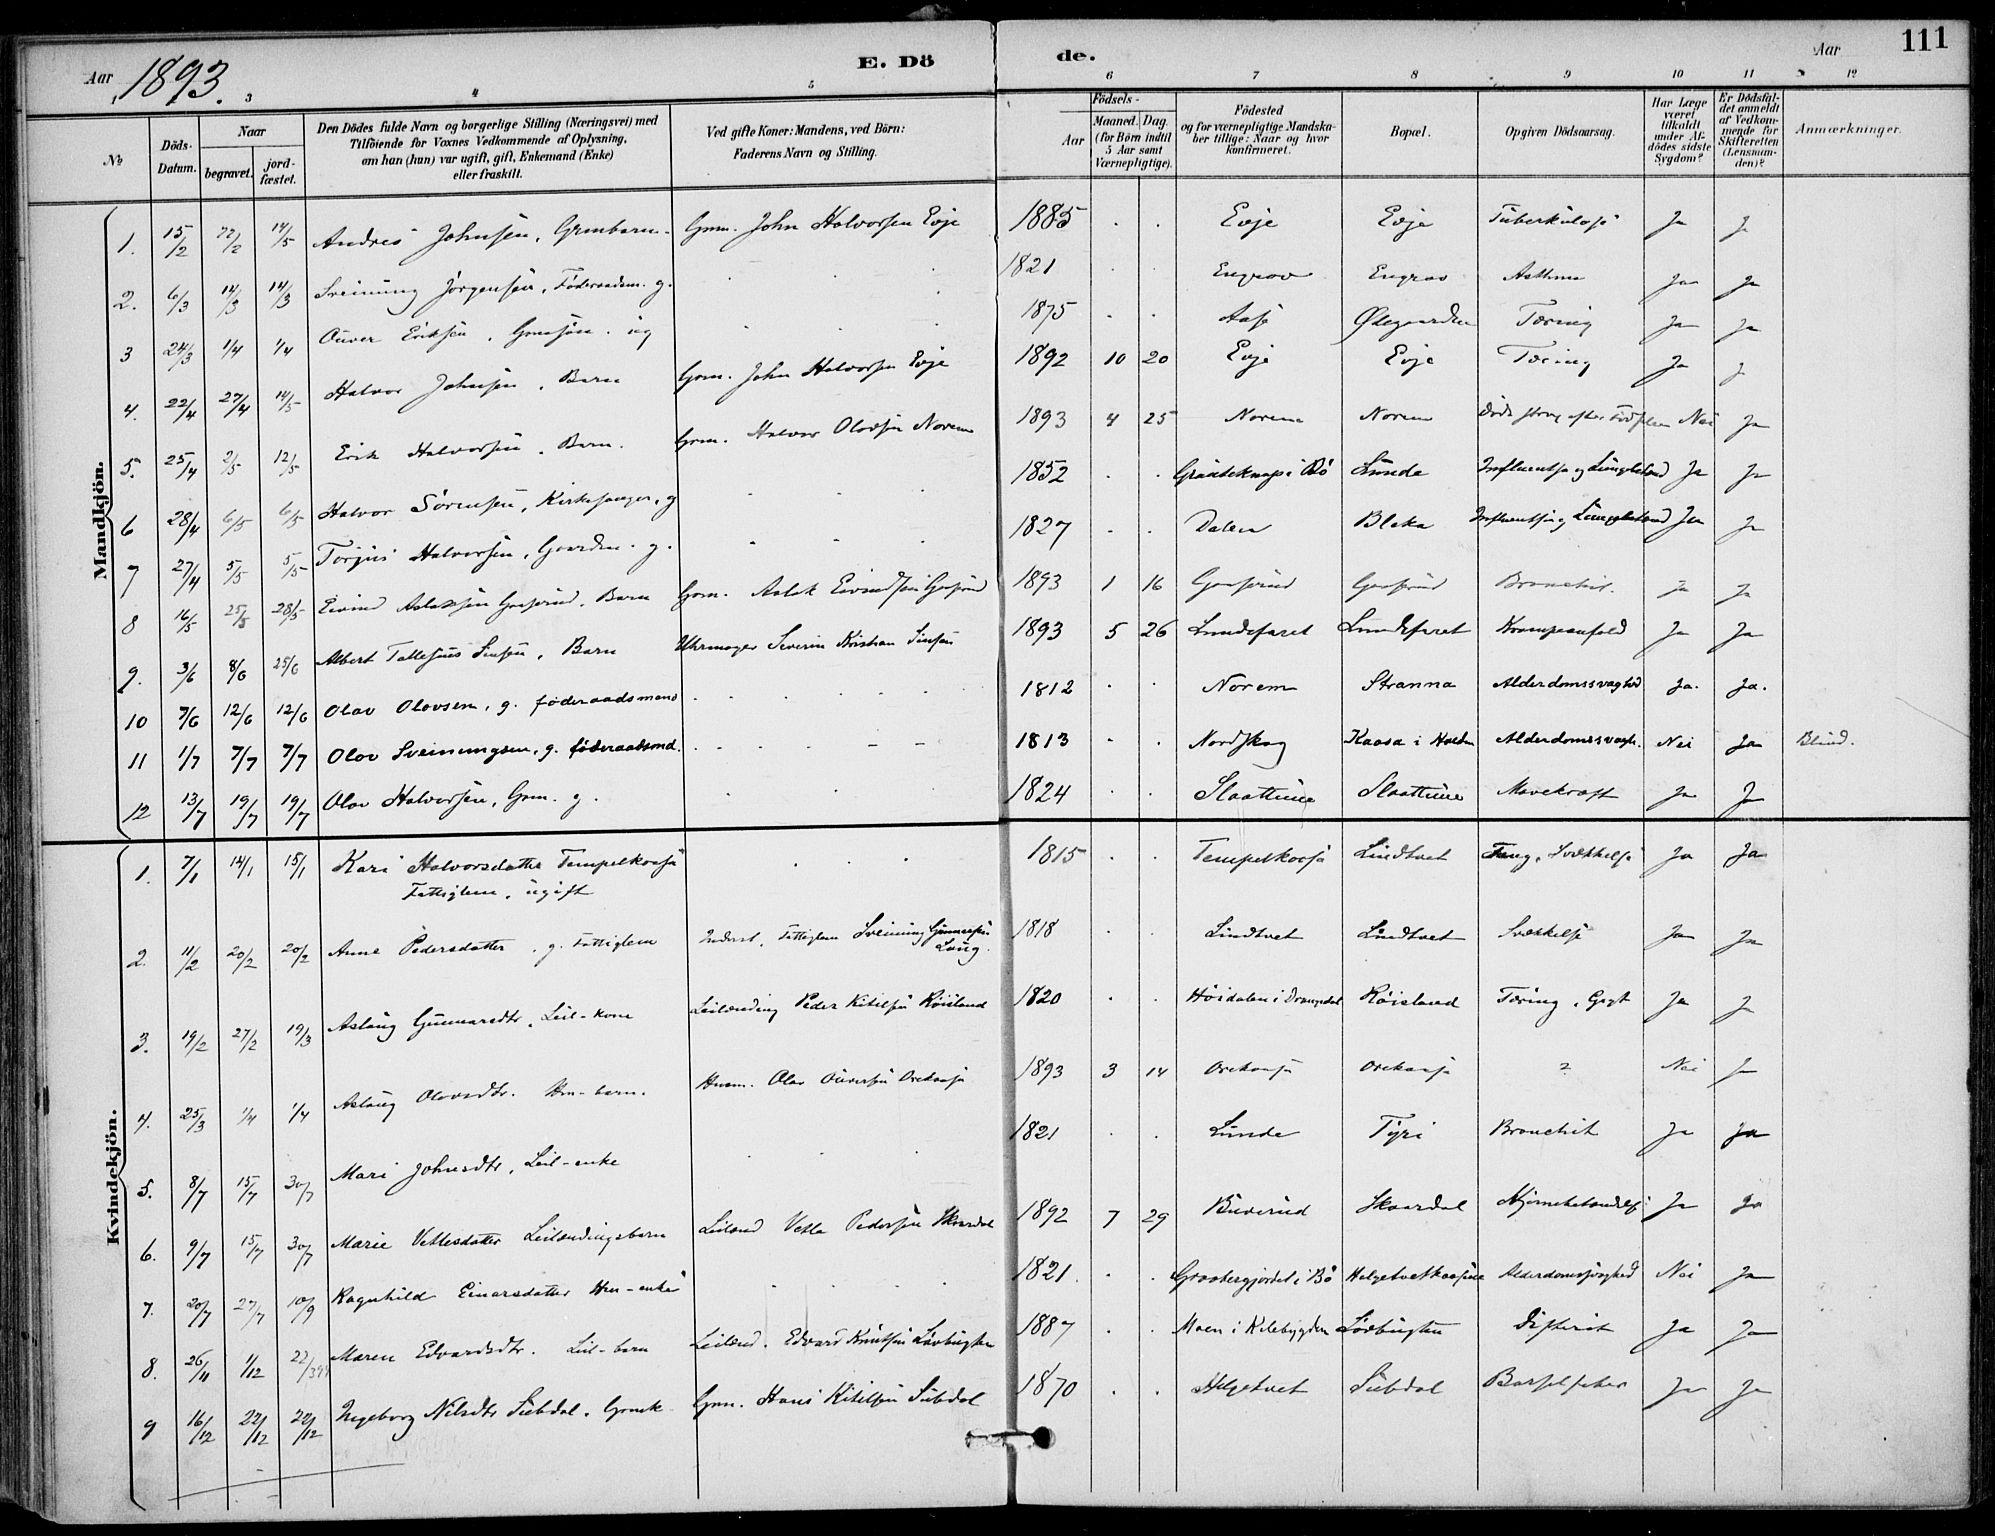 SAKO, Lunde kirkebøker, F/Fa/L0003: Ministerialbok nr. I 3, 1893-1902, s. 111